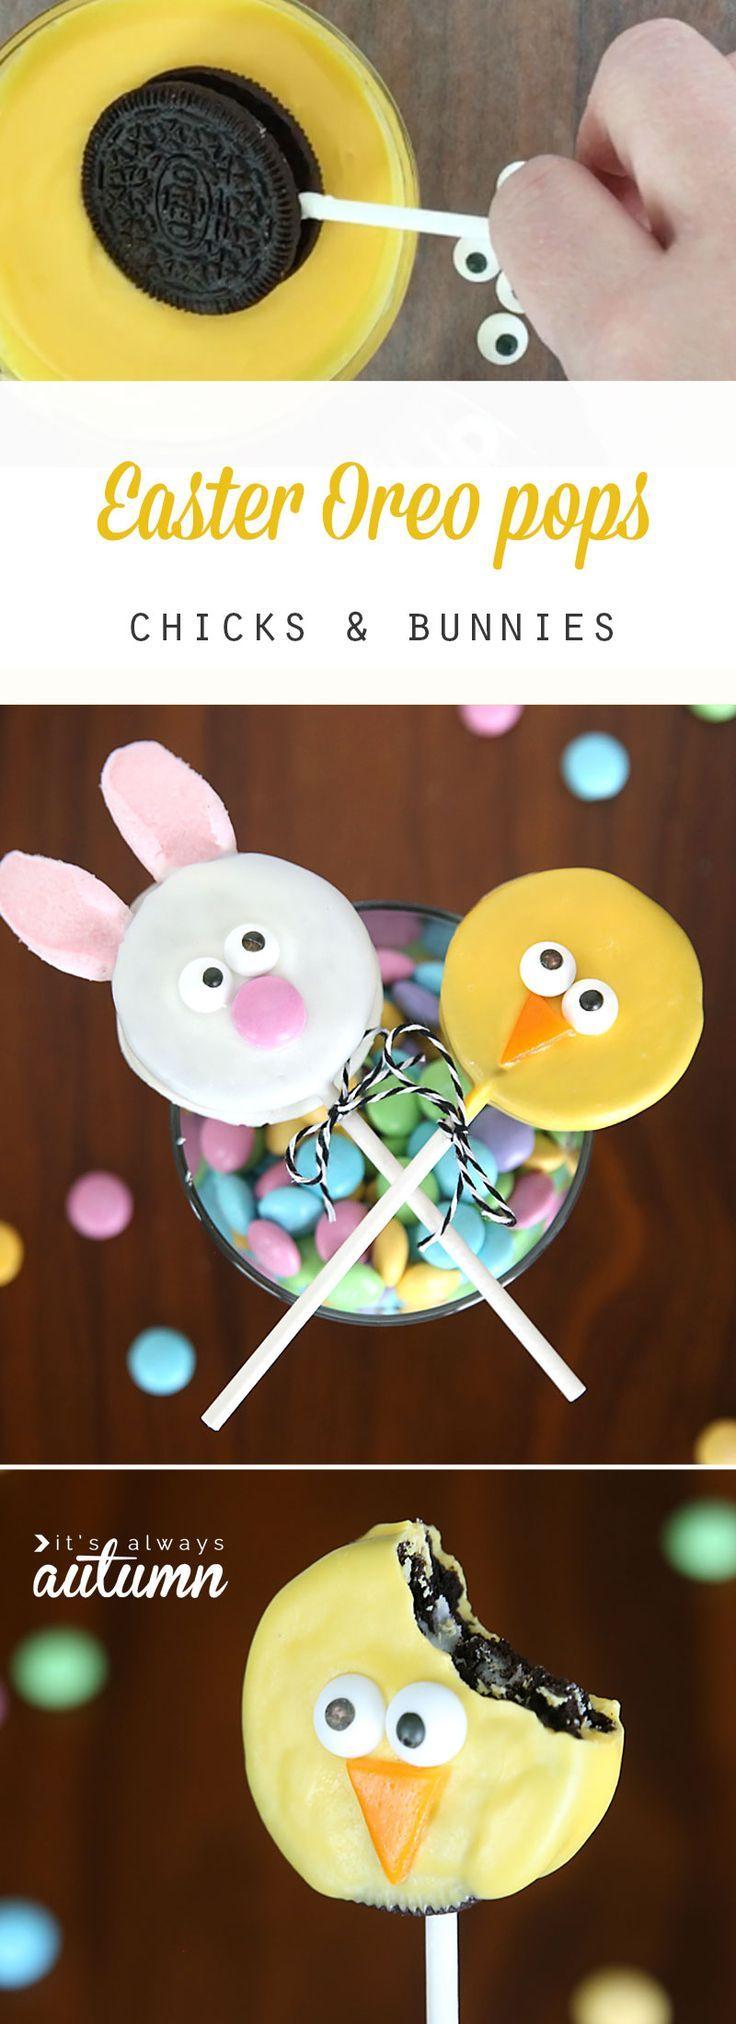 Easy Easter Bunny & Chick Oreo Pops